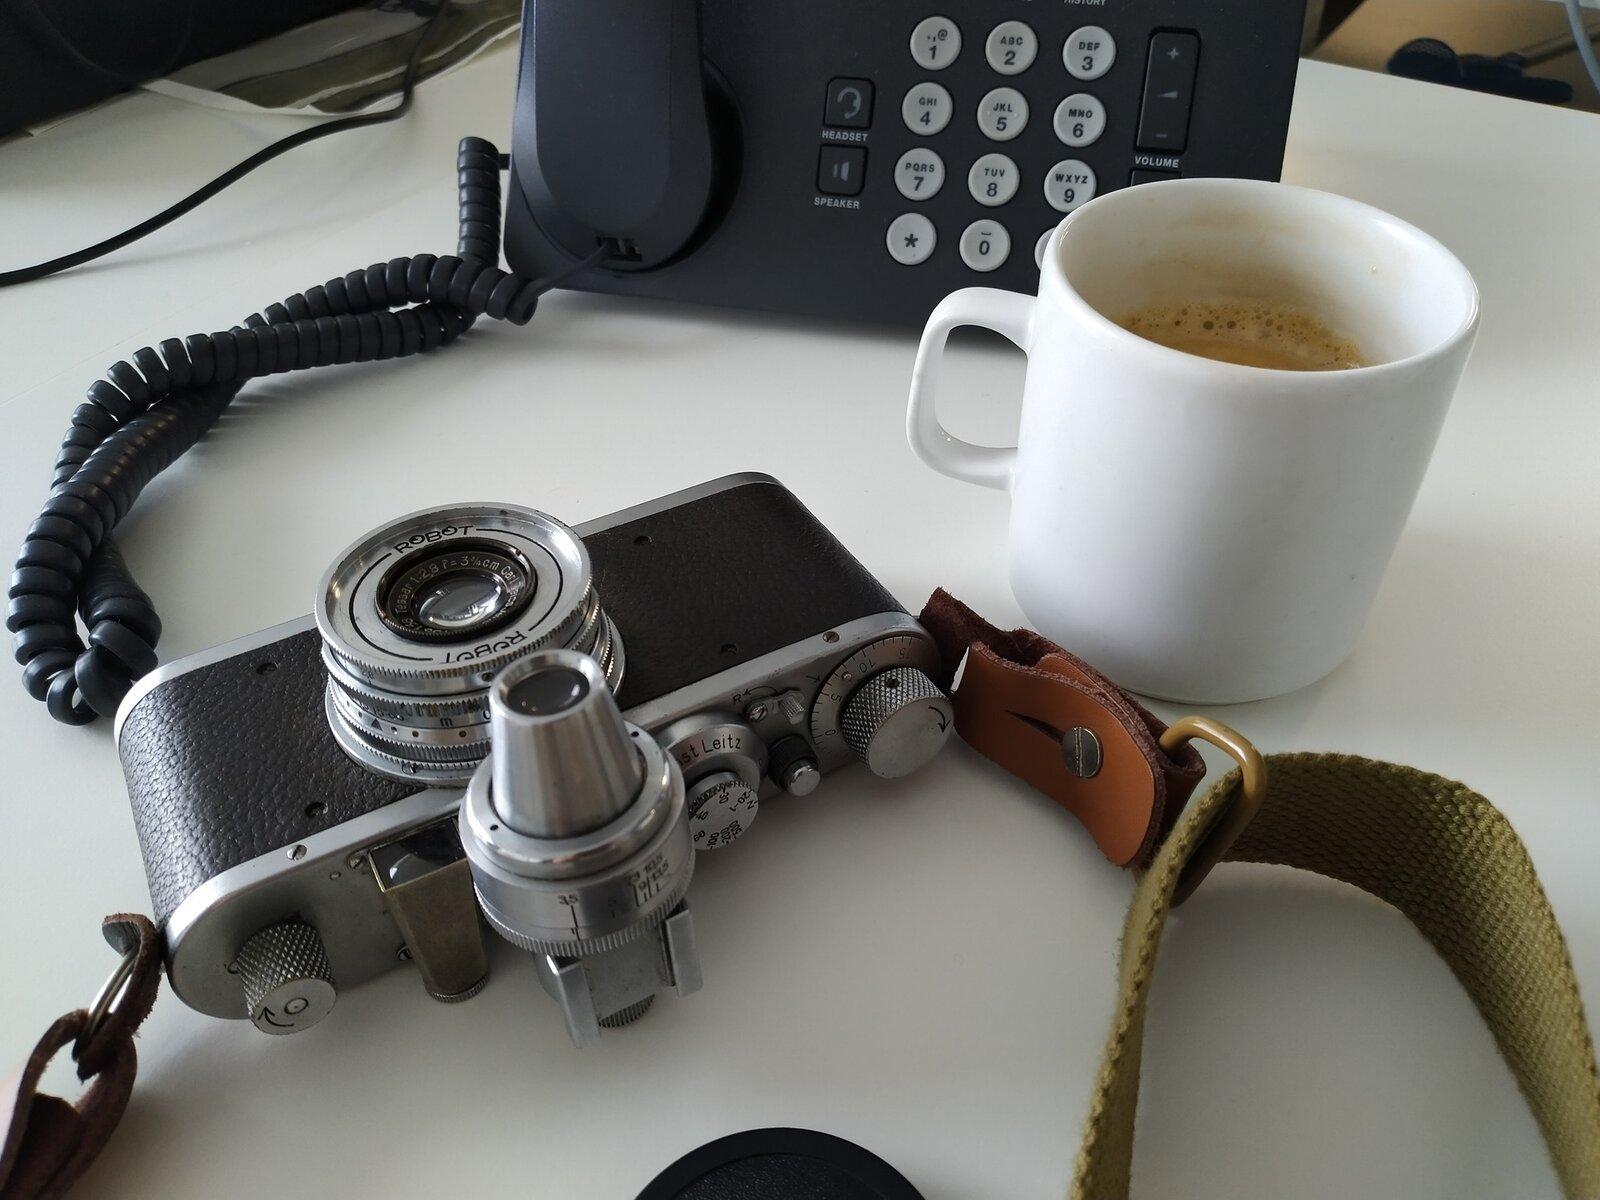 LeicaRobot.jpg